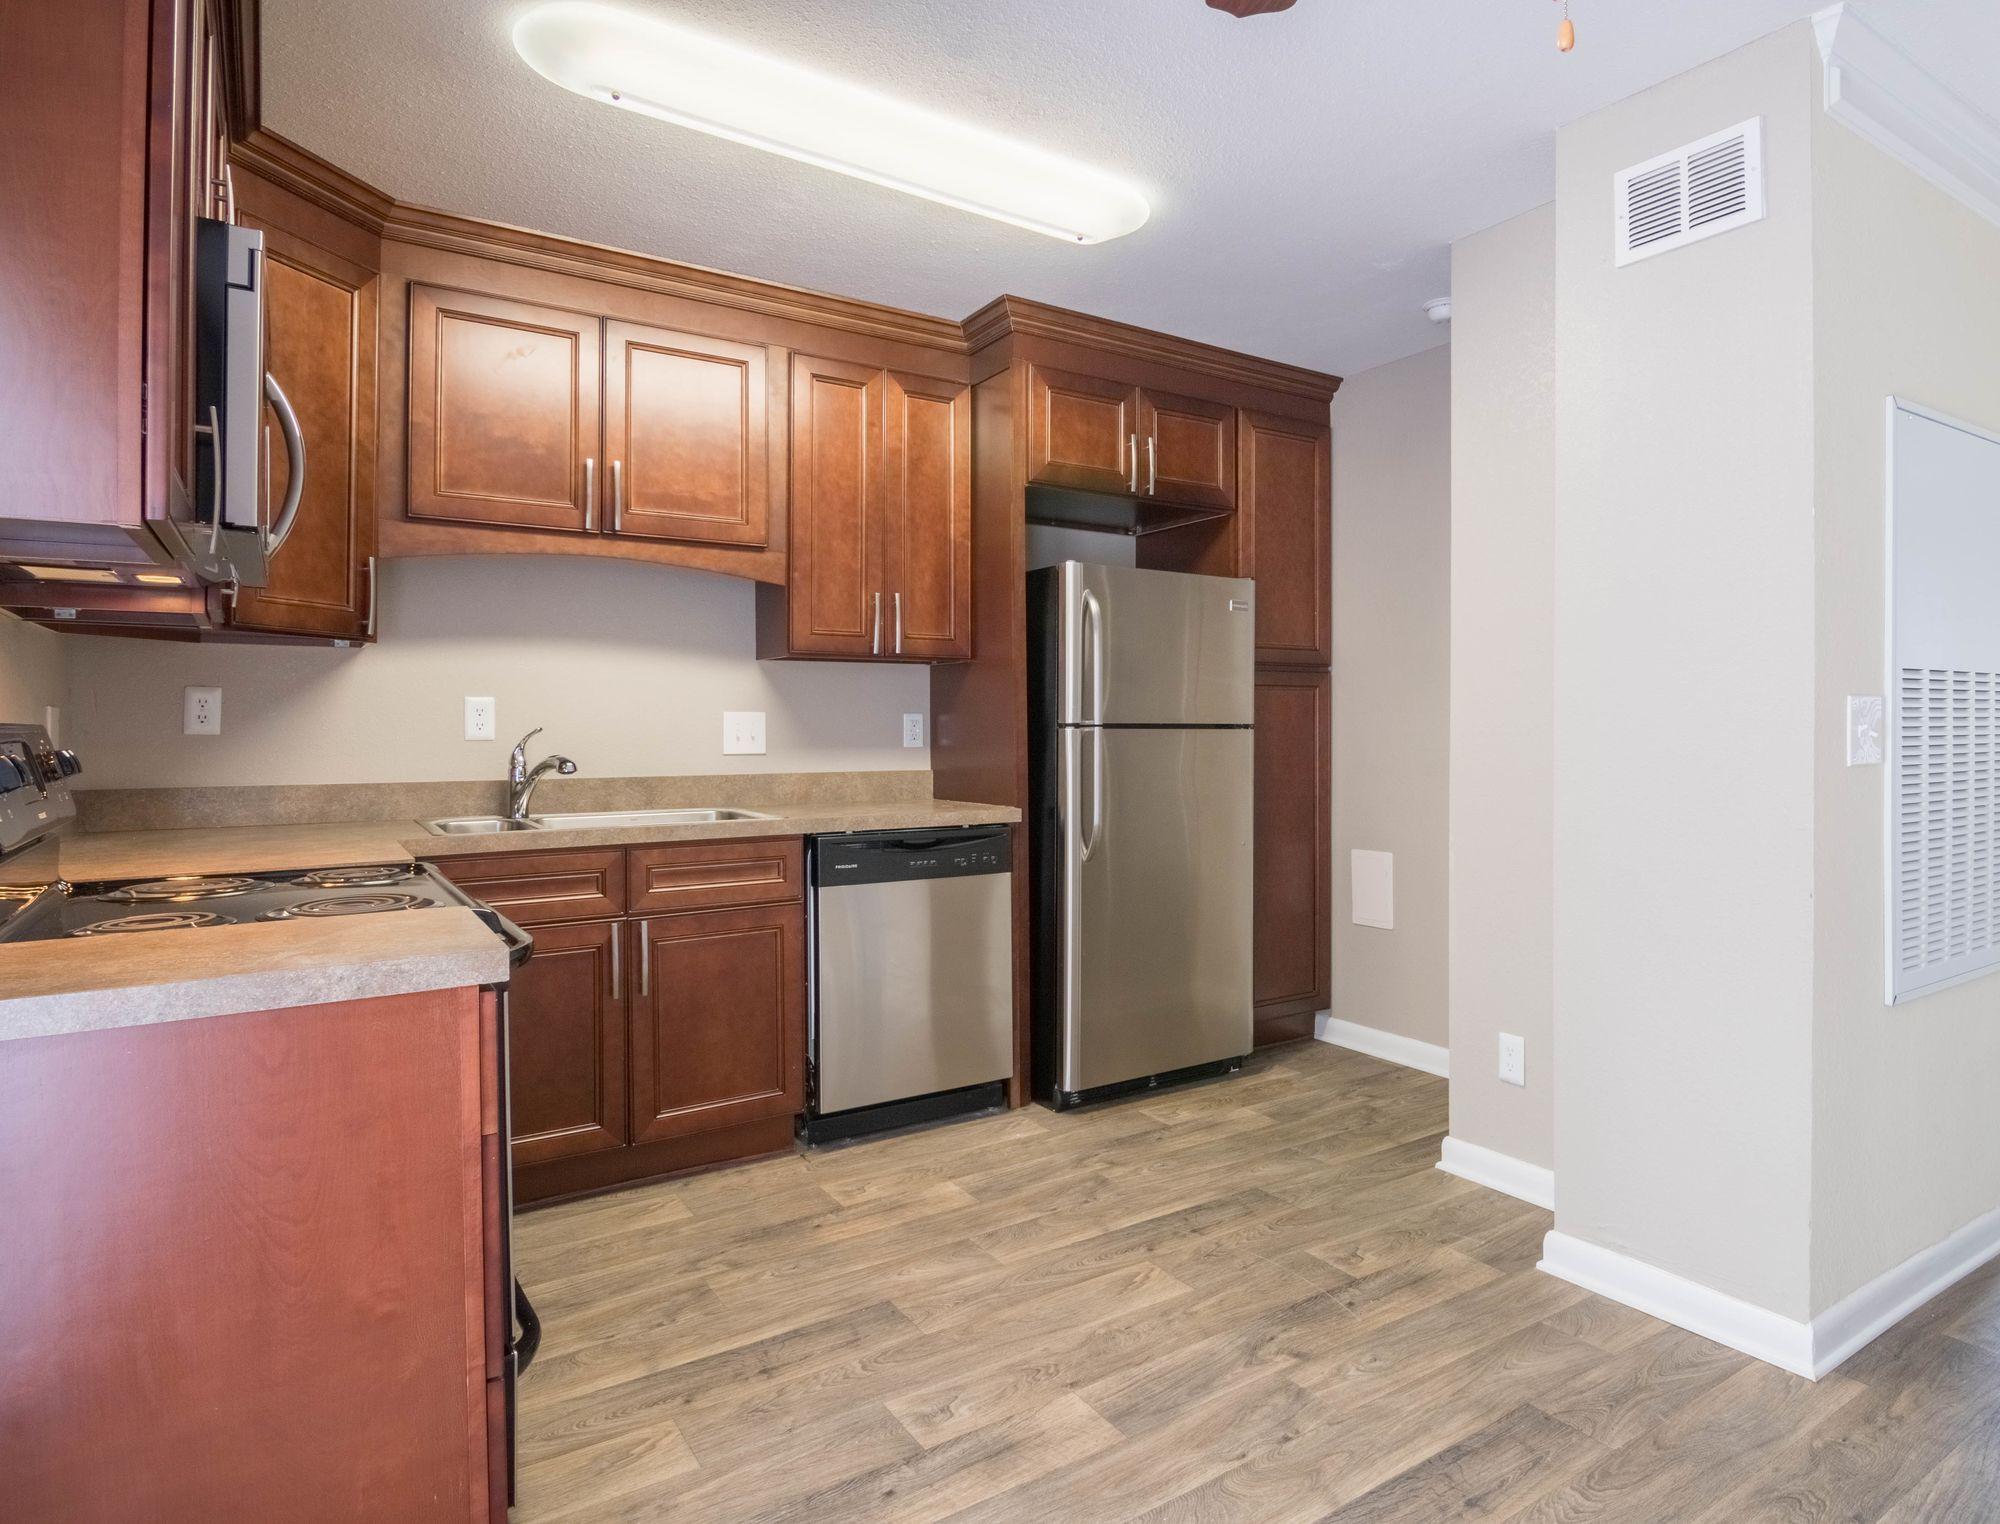 Apartments Near North Carolina Aurora for North Carolina Students in , NC